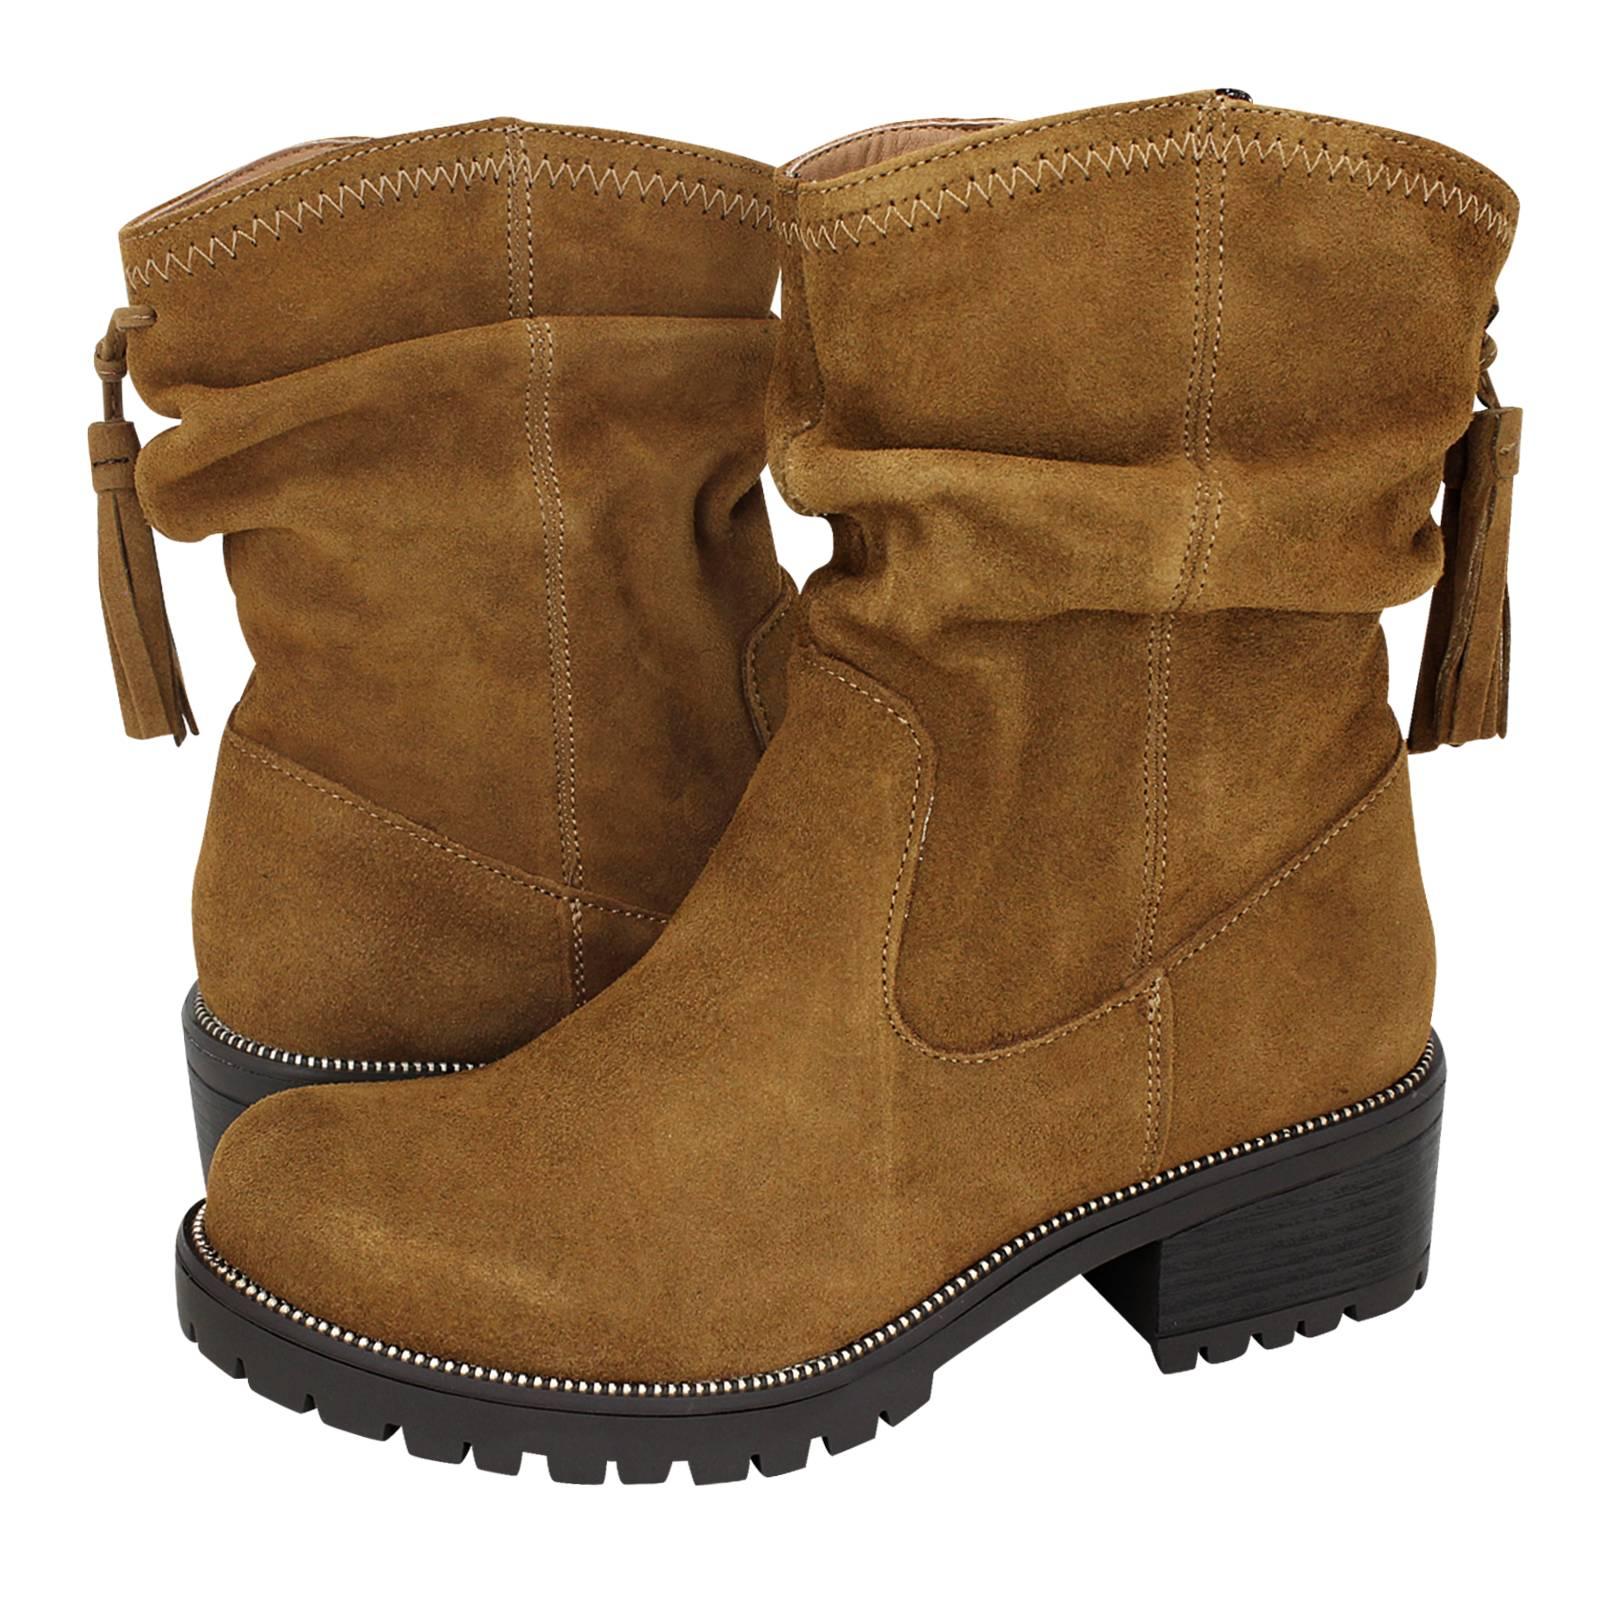 Tupigny - Esthissis Women s low boots made of suede - Gianna Kazakou ... bb65ed17ef6